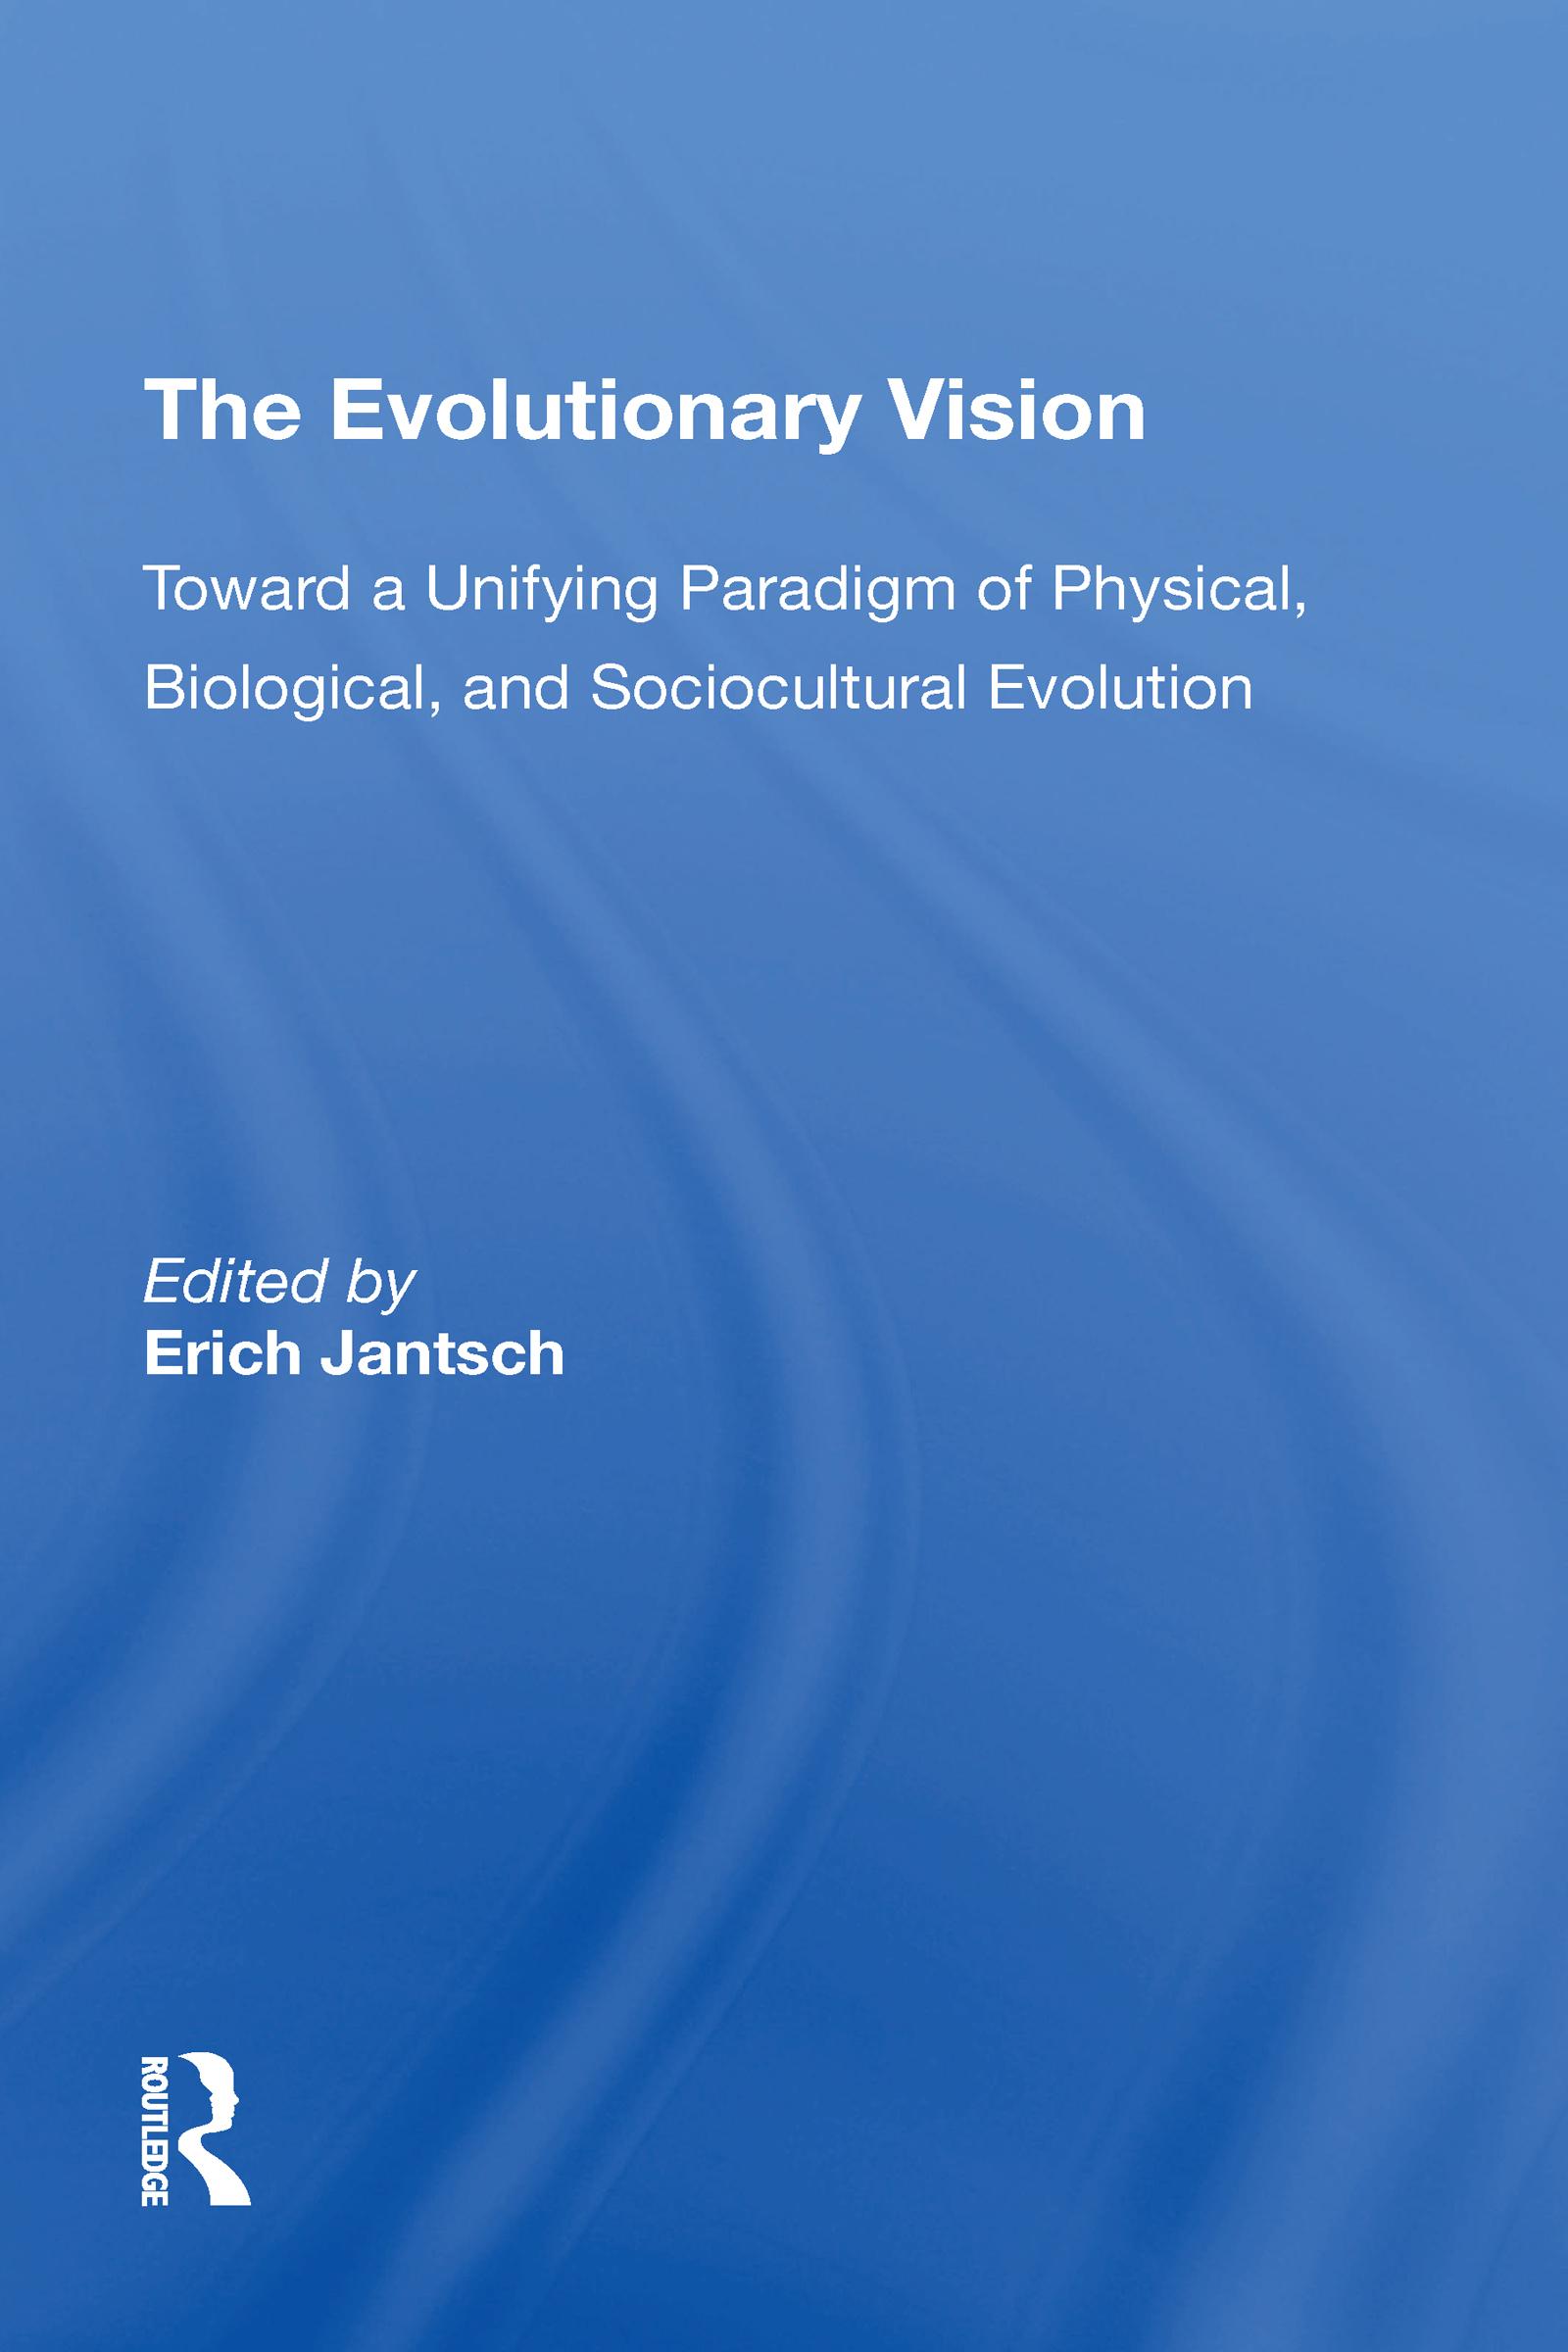 The Evolutionary Vision